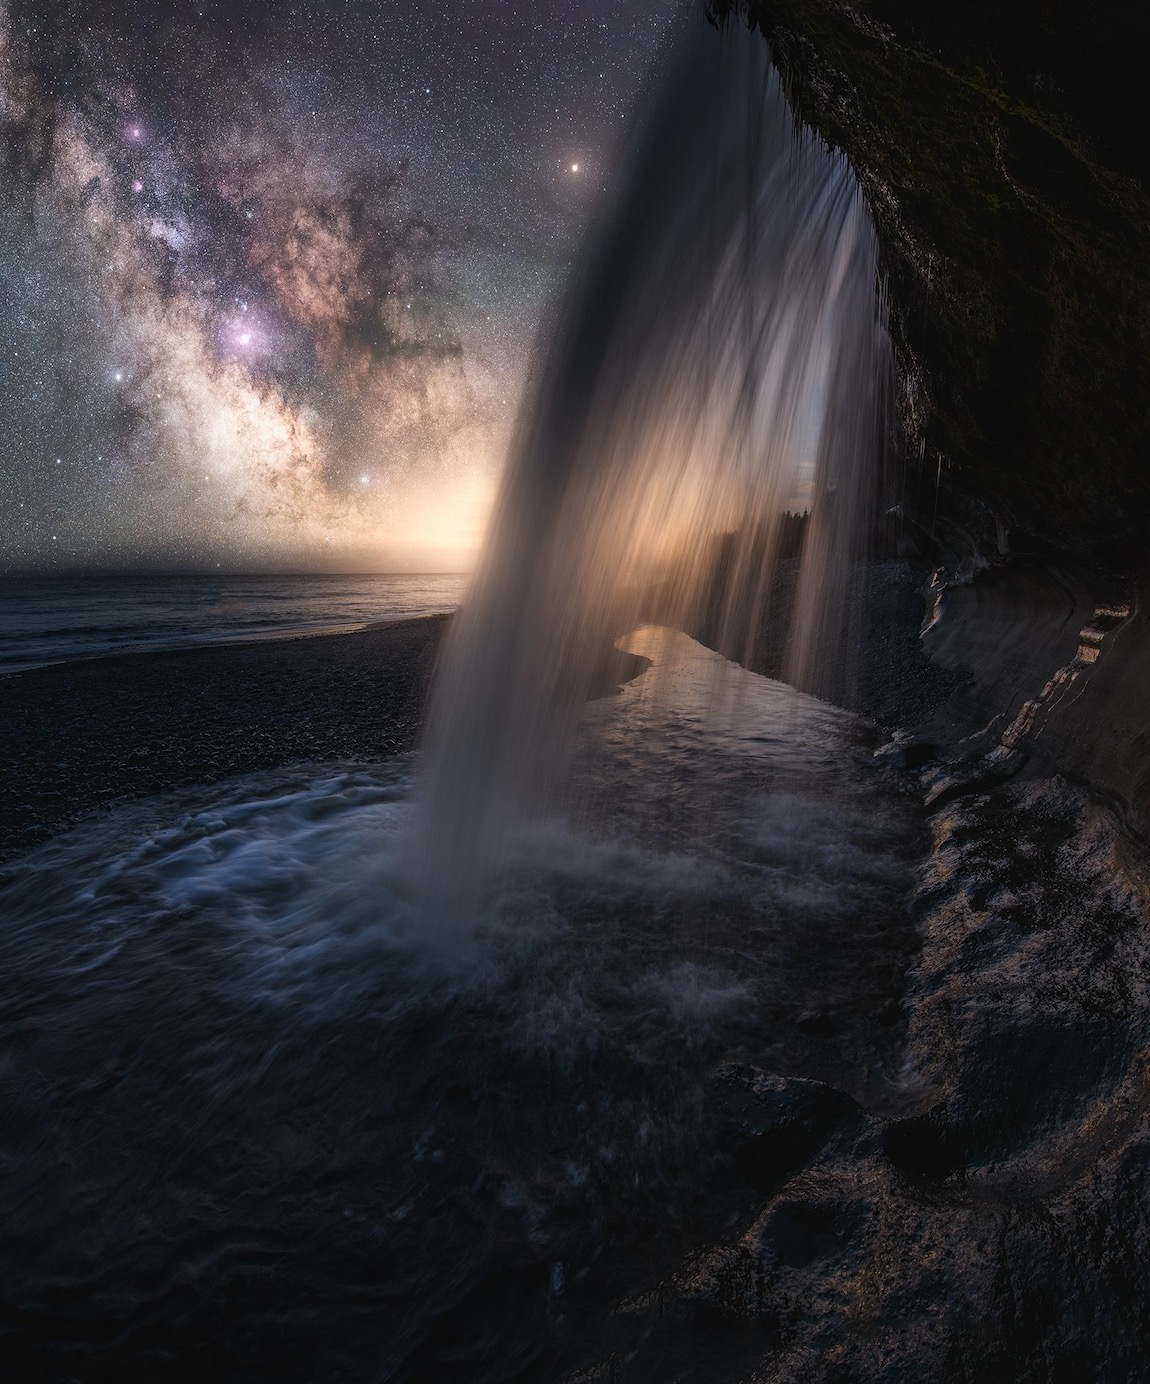 night-landscape-photography-8